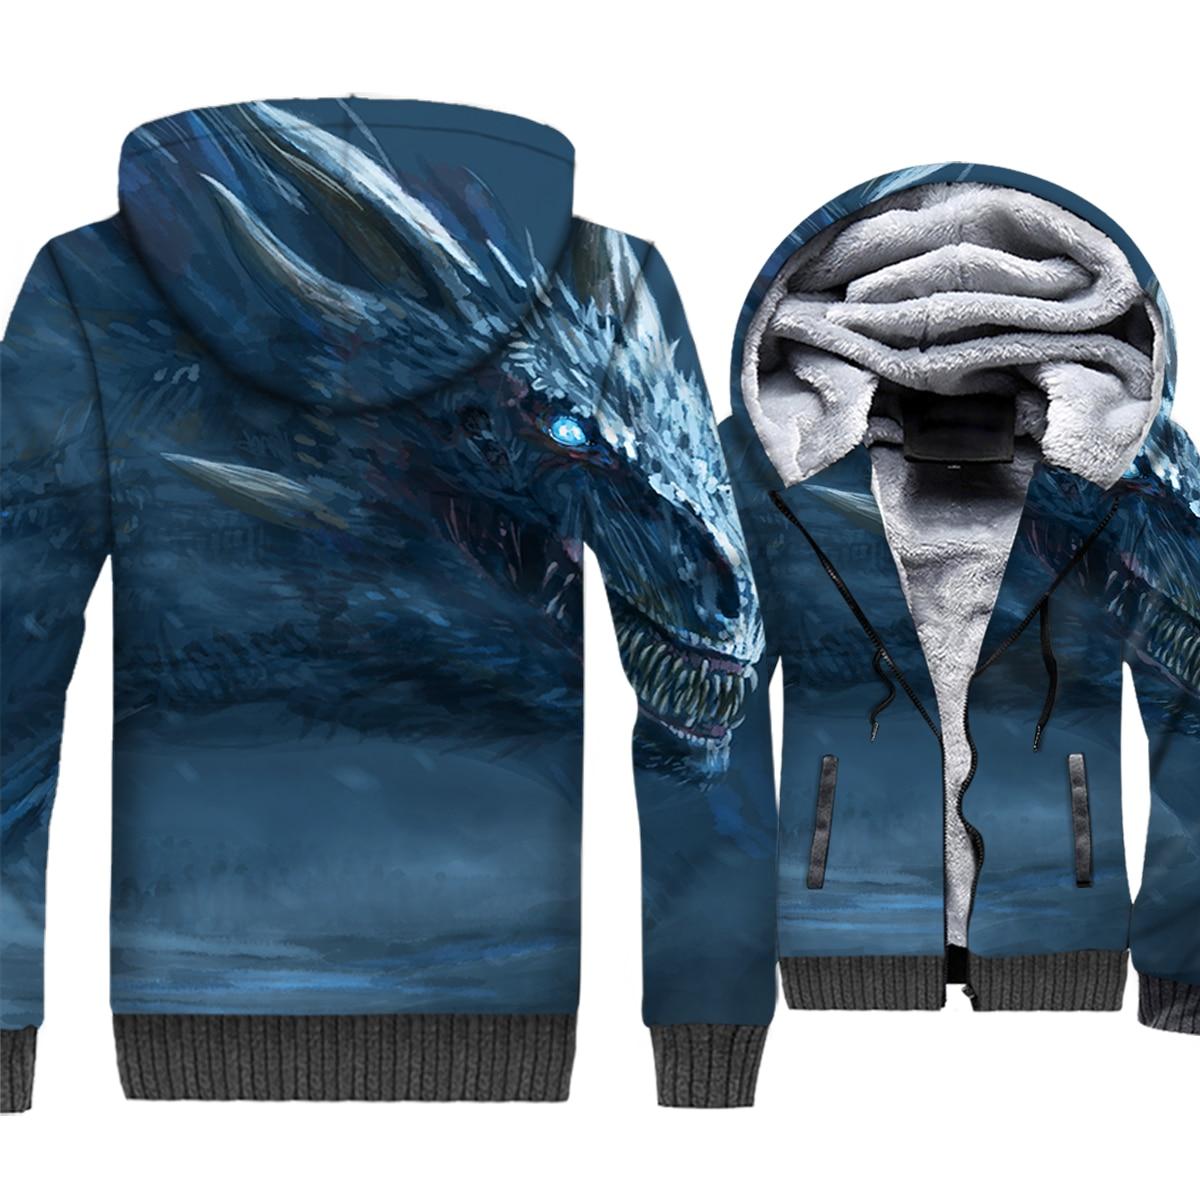 Game of Thrones 3D Print Hoodie Men White Walkers The Night King Hooded Sweatshirt Winter Thick Fleece Zip up Coat Dragon Jacket